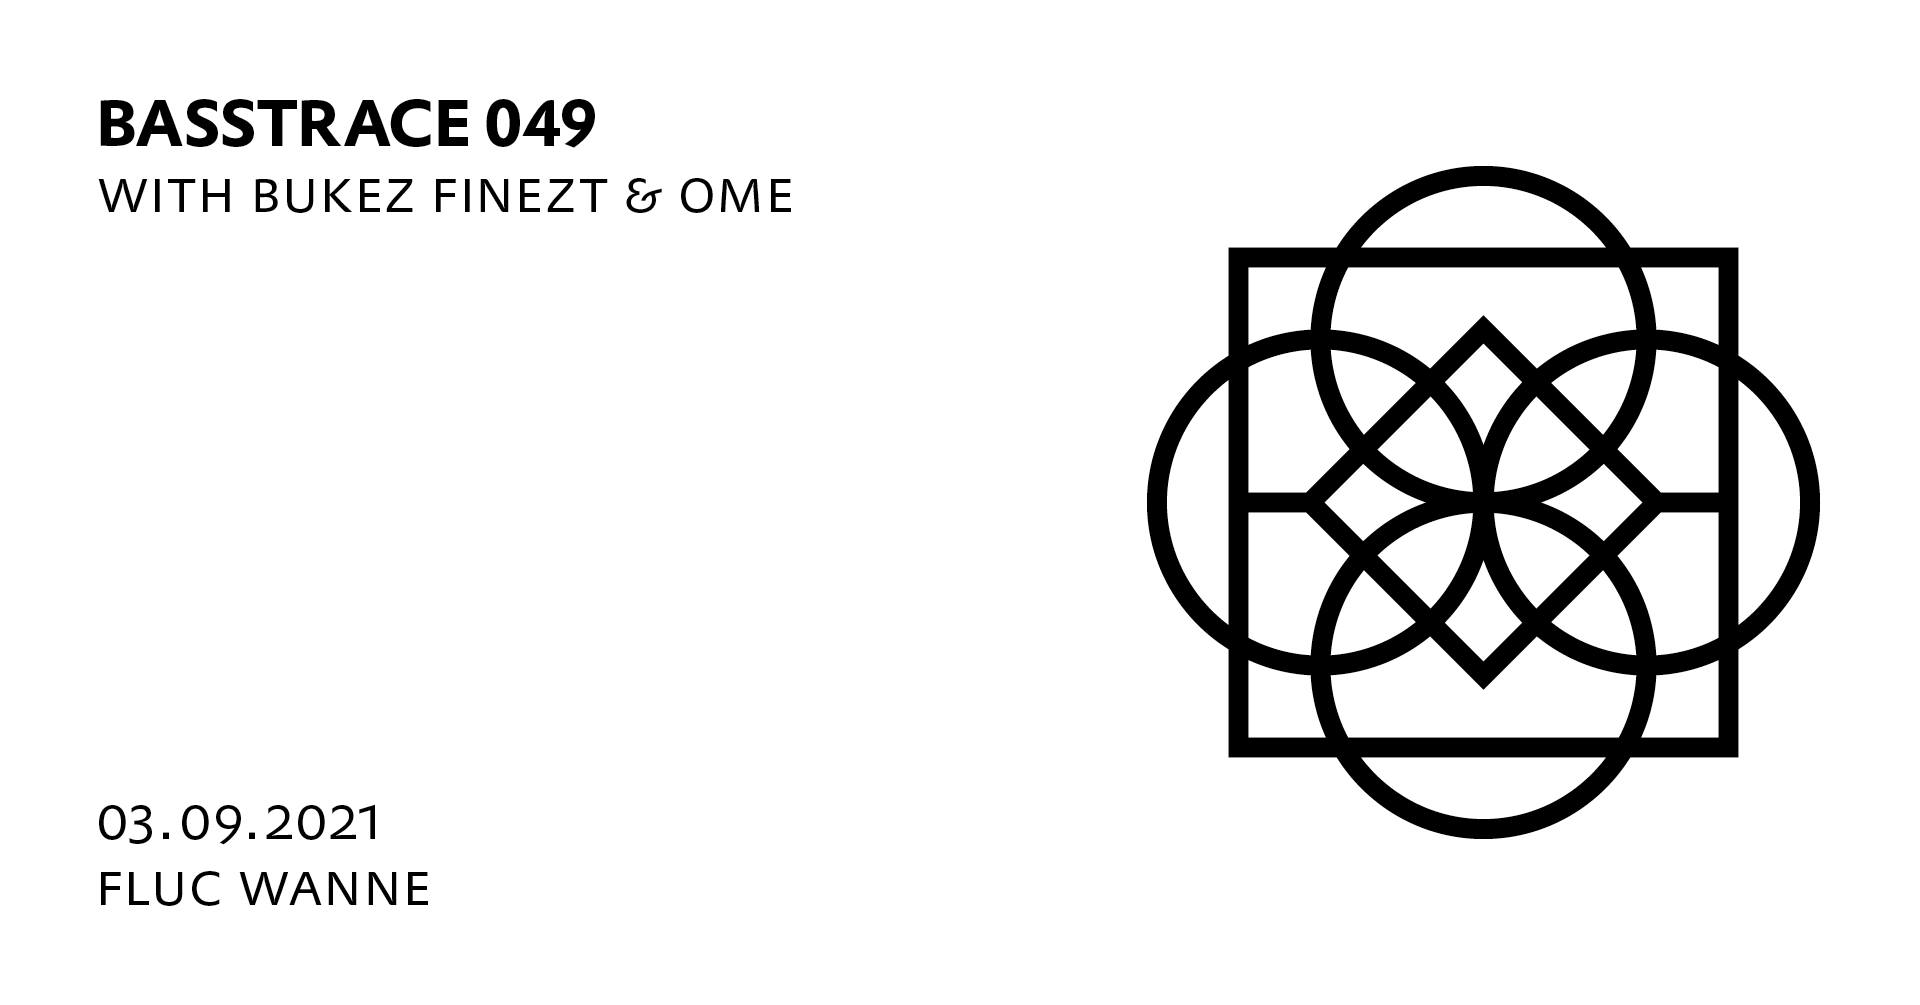 BASSTRACE 049 with BUKEZ FINEZT & OME am 3. September 2021 @ Fluc Wanne.